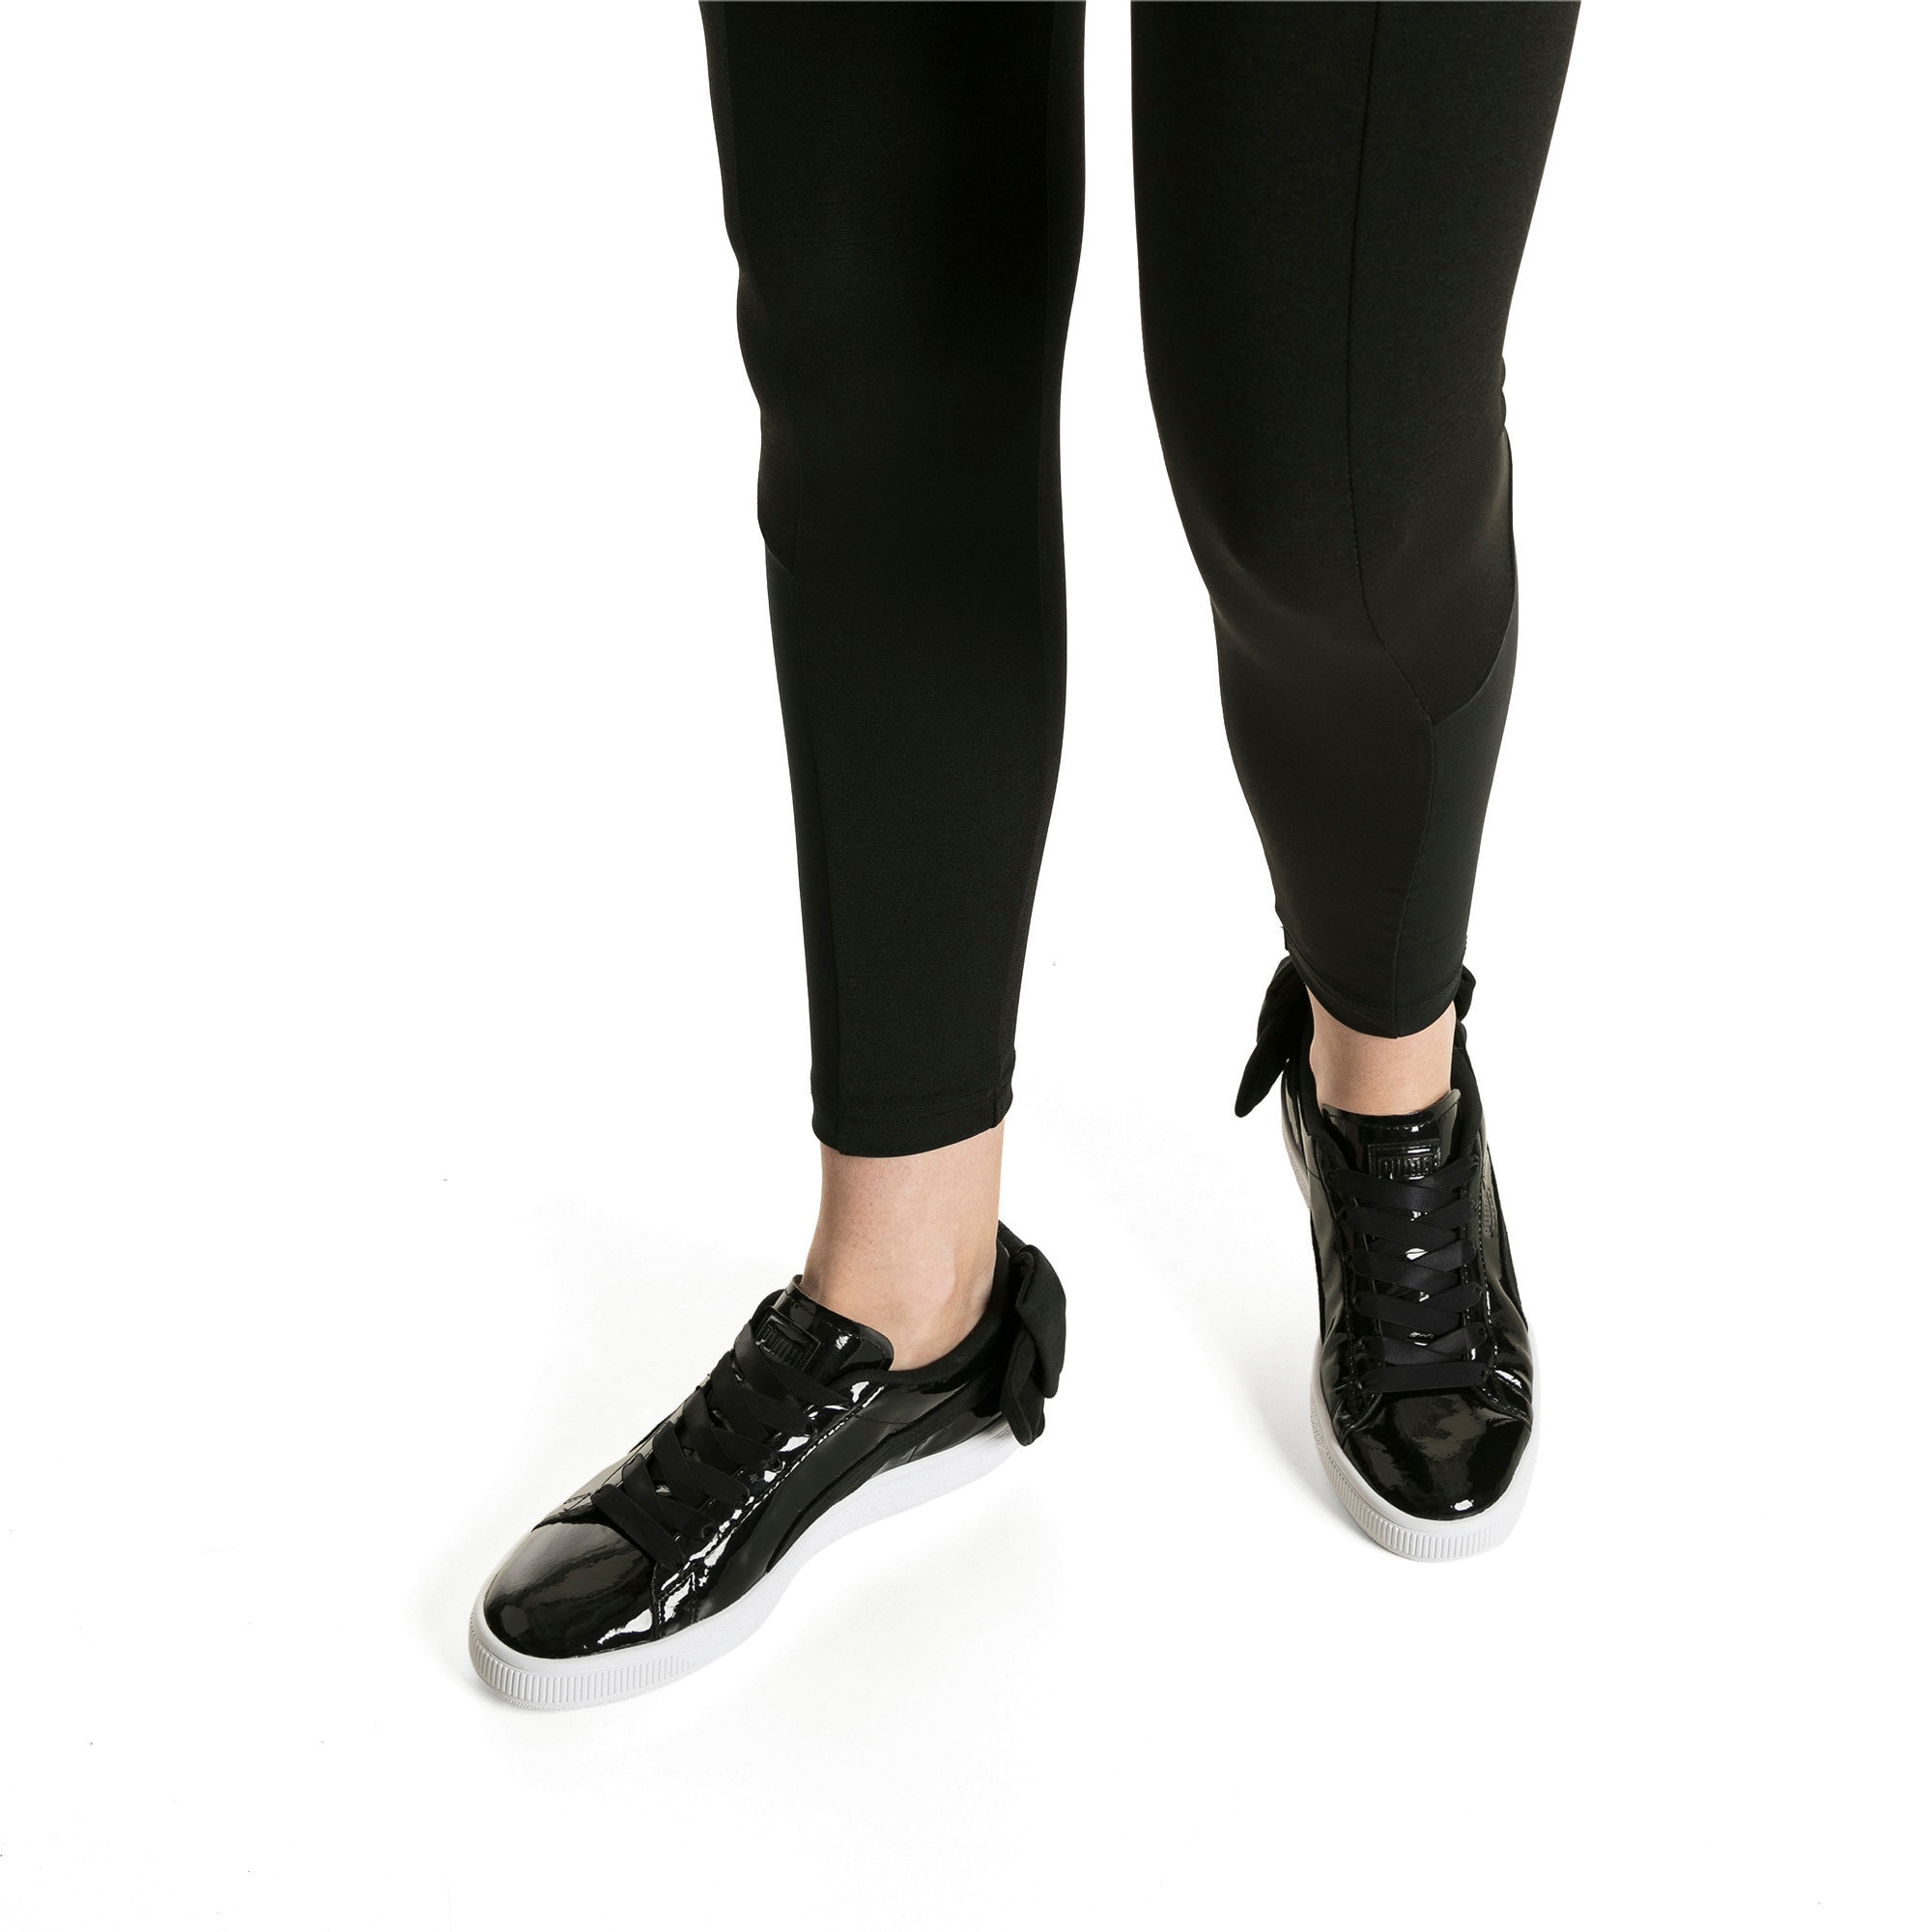 Thumbnail 7 of Basket Suede Bow Women's Sneakers, Puma Black-Puma Black, medium